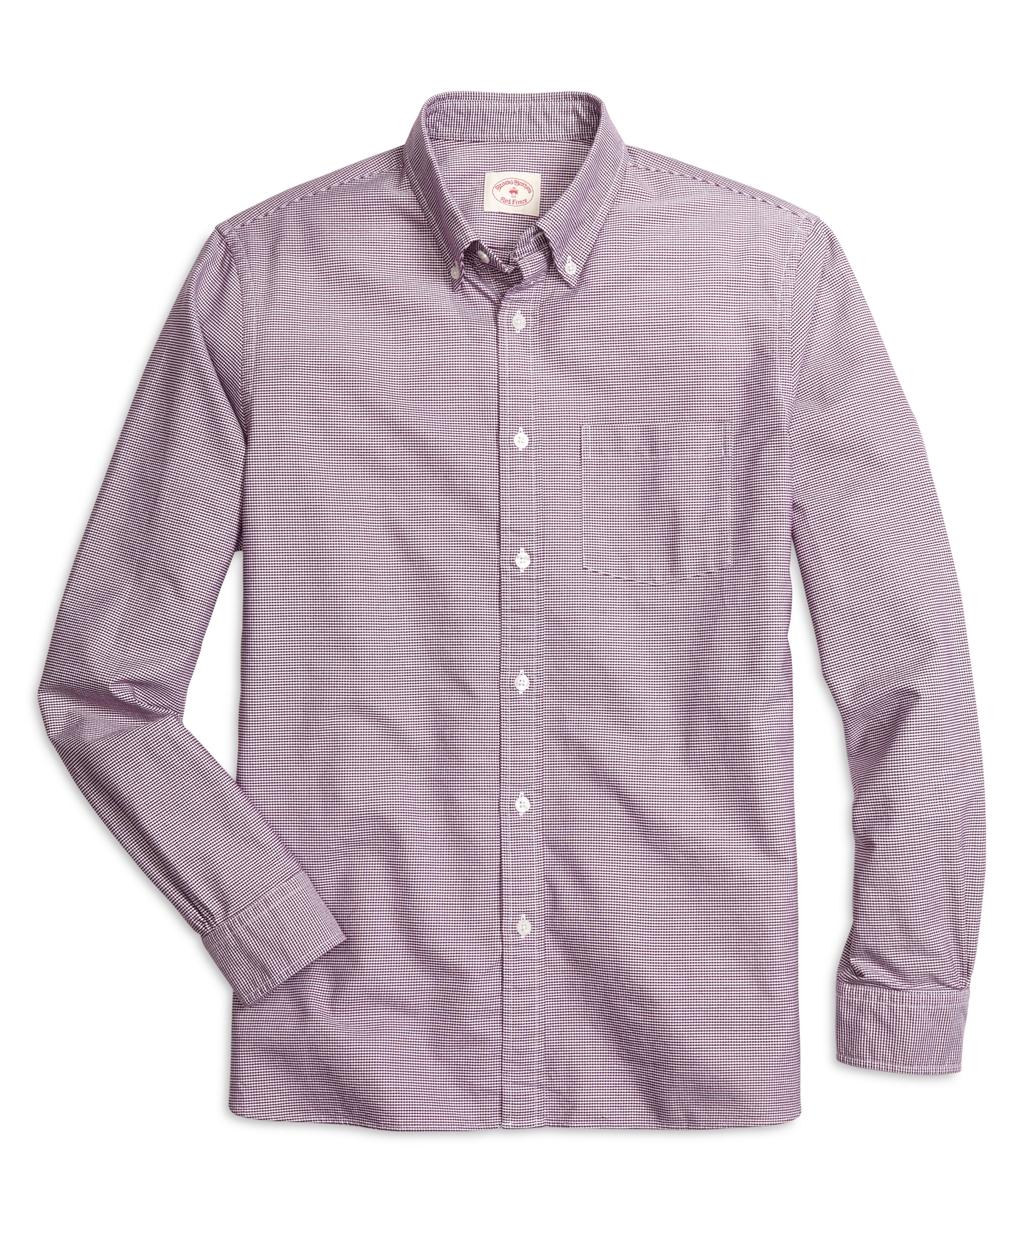 Brooks brothers supima cotton check sport shirt in purple for Brooks brothers sports shirts